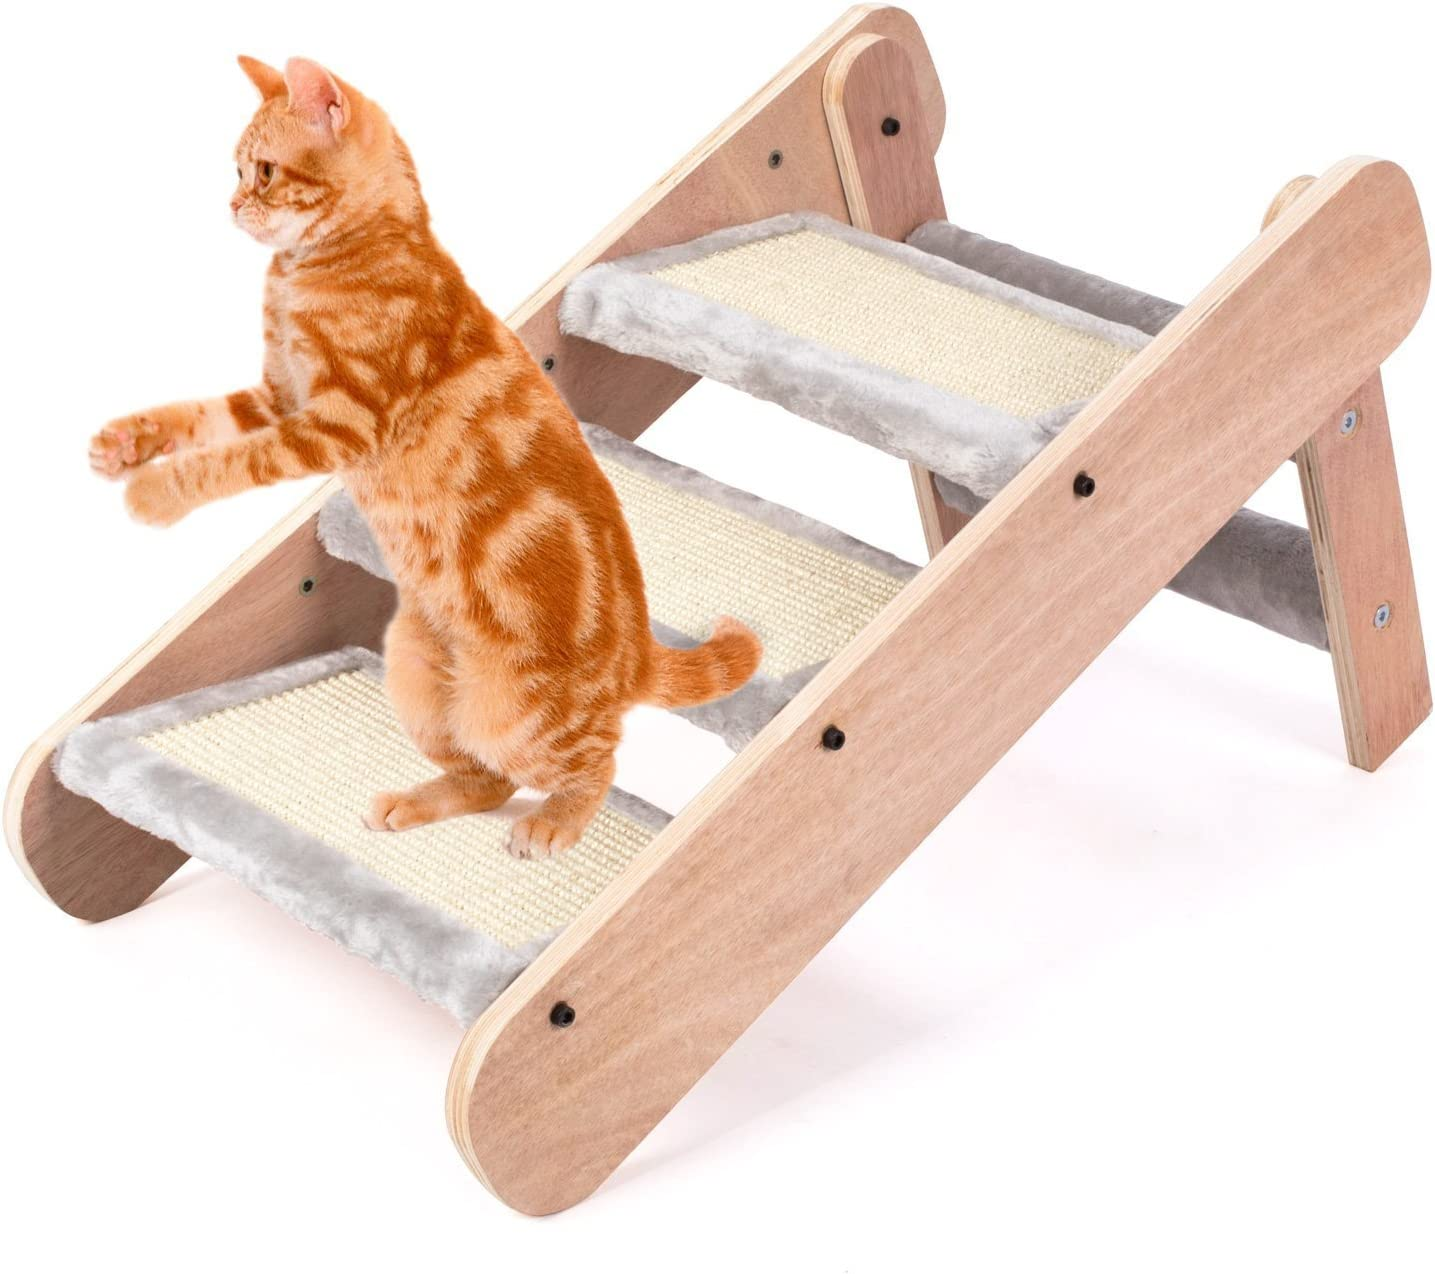 Pedy - Rascador para gatos con forma de escalera: Amazon.es: Productos para mascotas